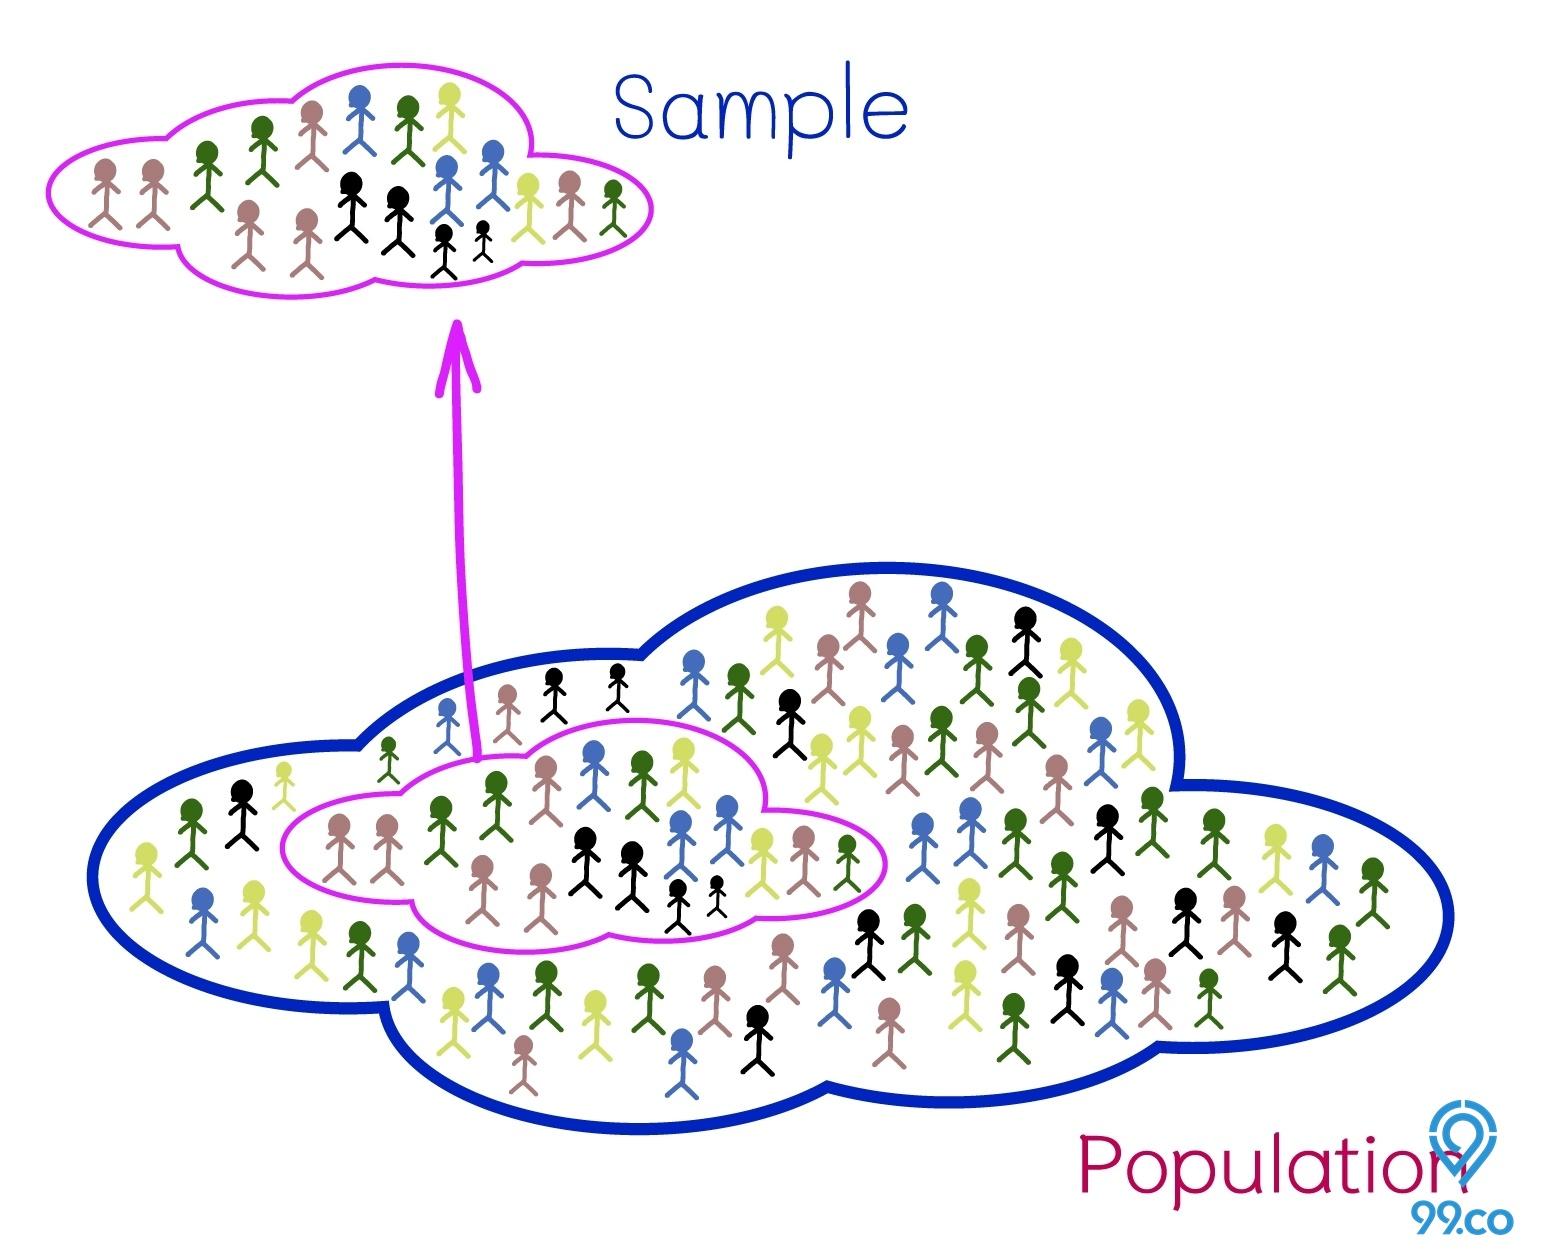 Pengertian Cluster Sampling Lengkap Dengan Cara Dan Contohnya